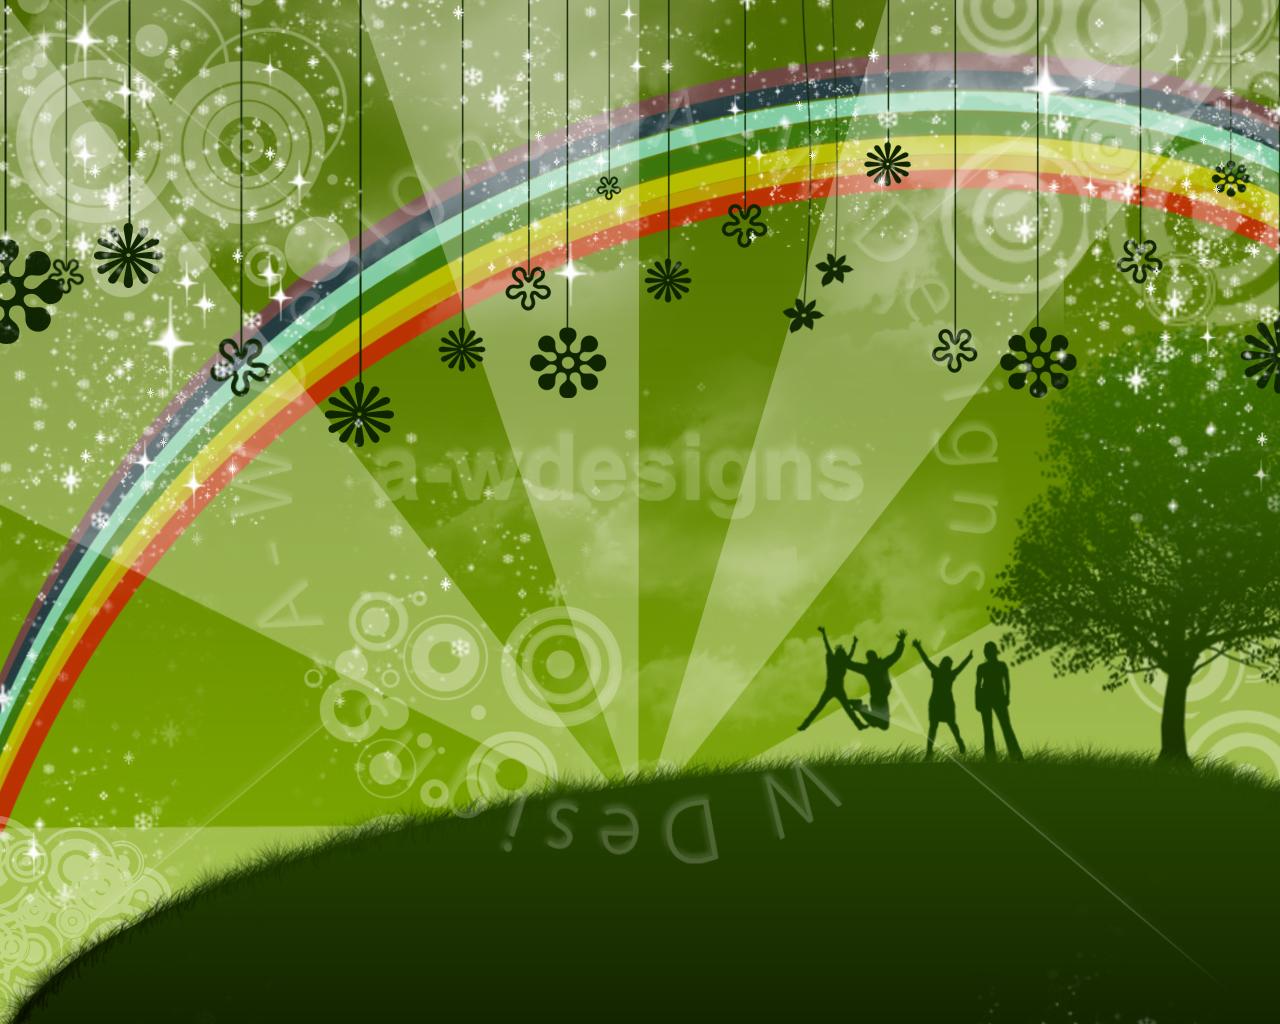 http://2.bp.blogspot.com/-xpcrZY0qXe8/TbWG9G-NWzI/AAAAAAAAAEk/OLHrg2NePPY/s1600/vector_wallpaper+.jpg